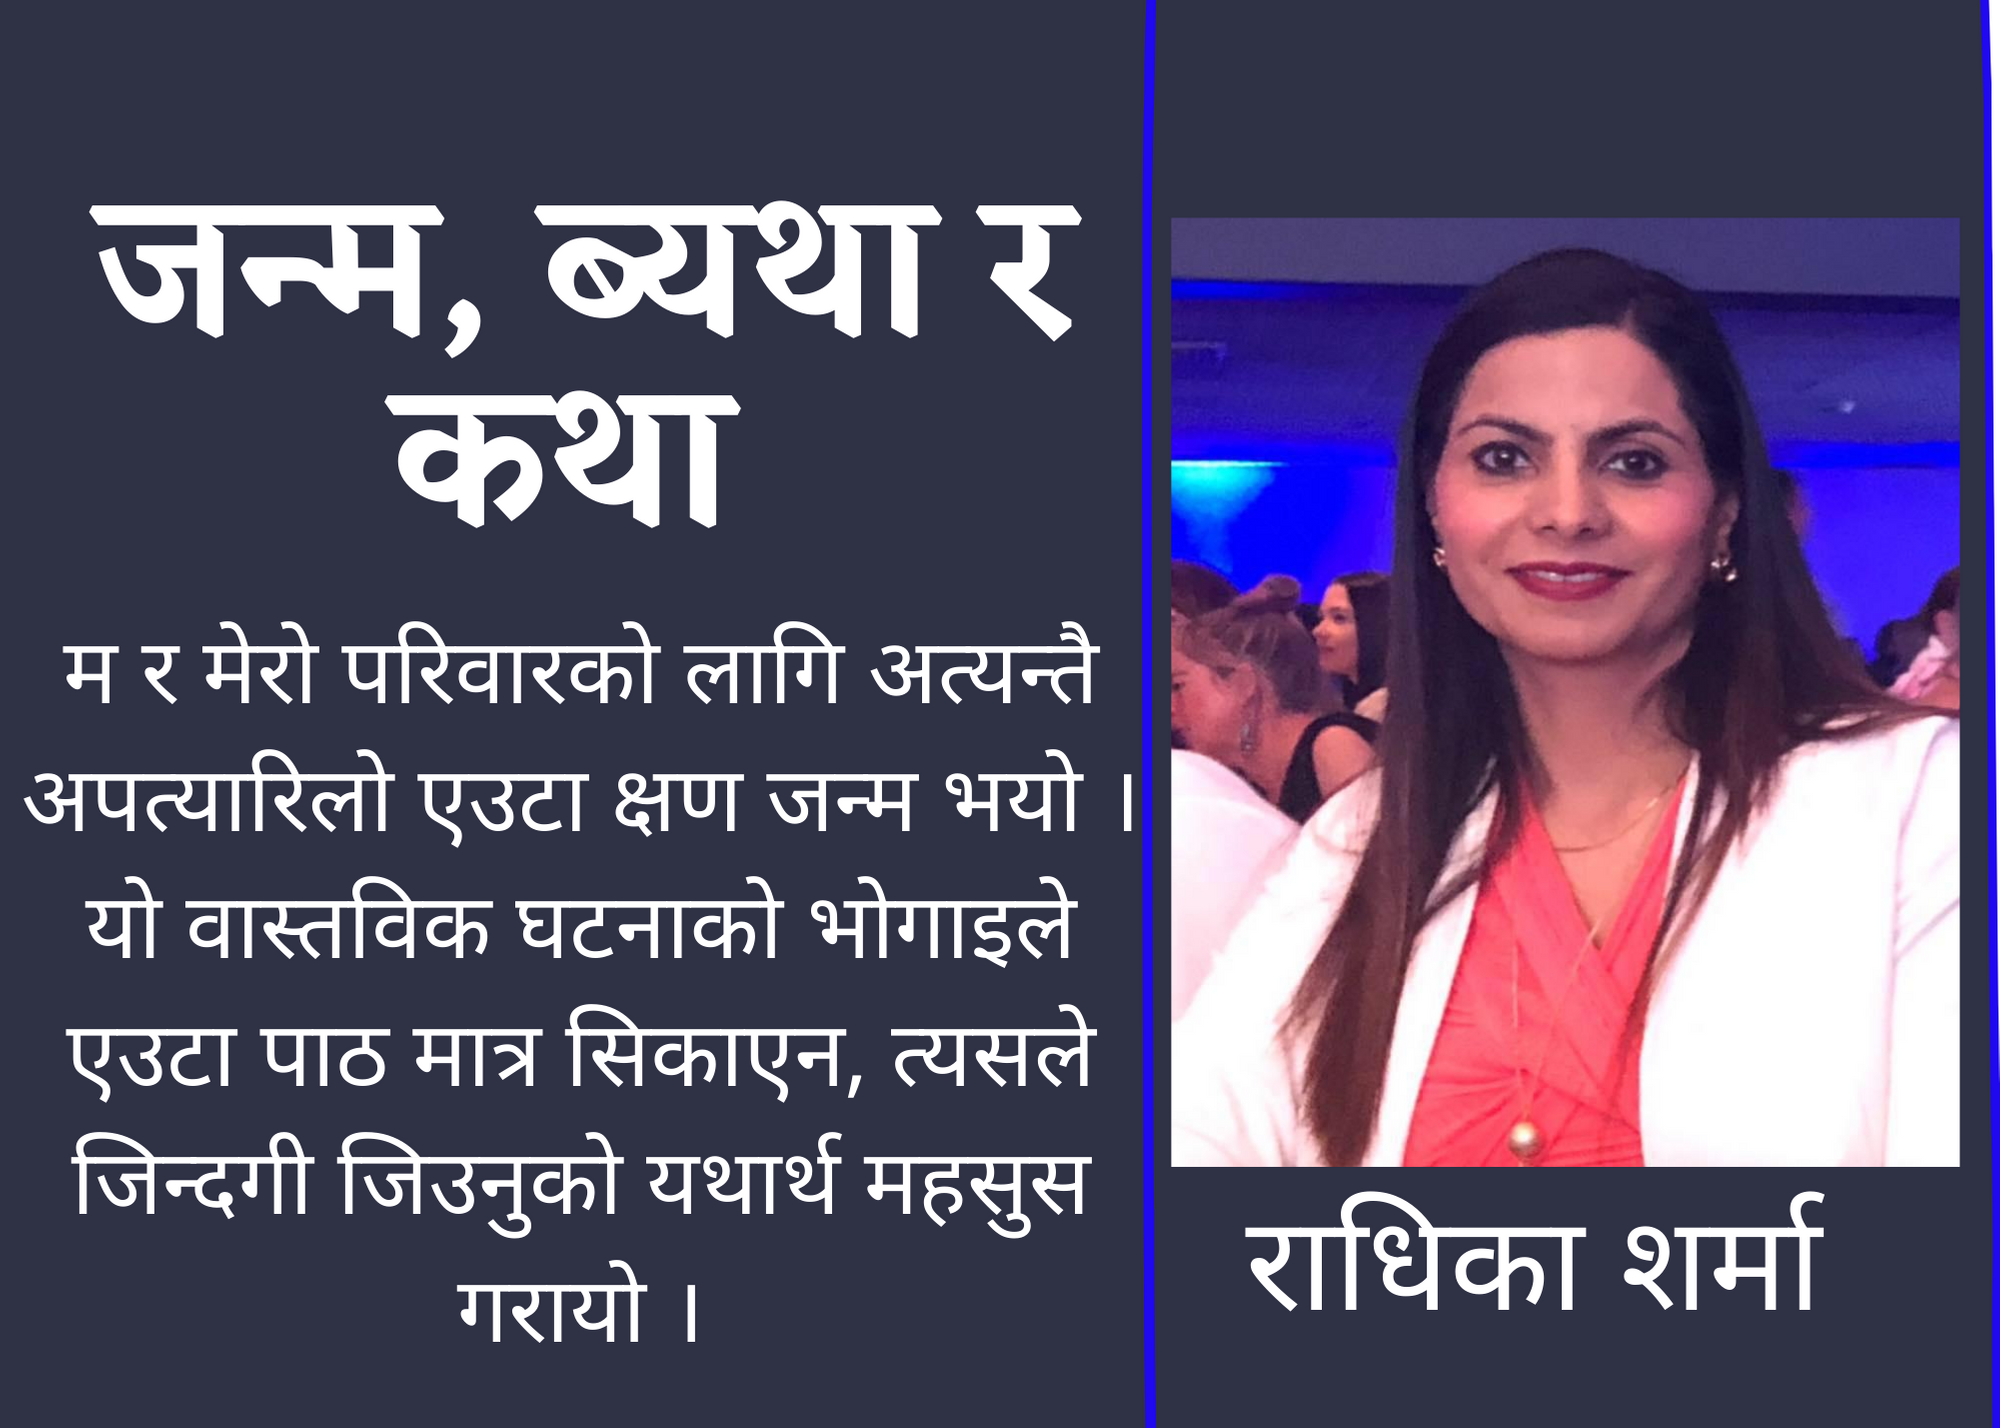 Radhika Sharma